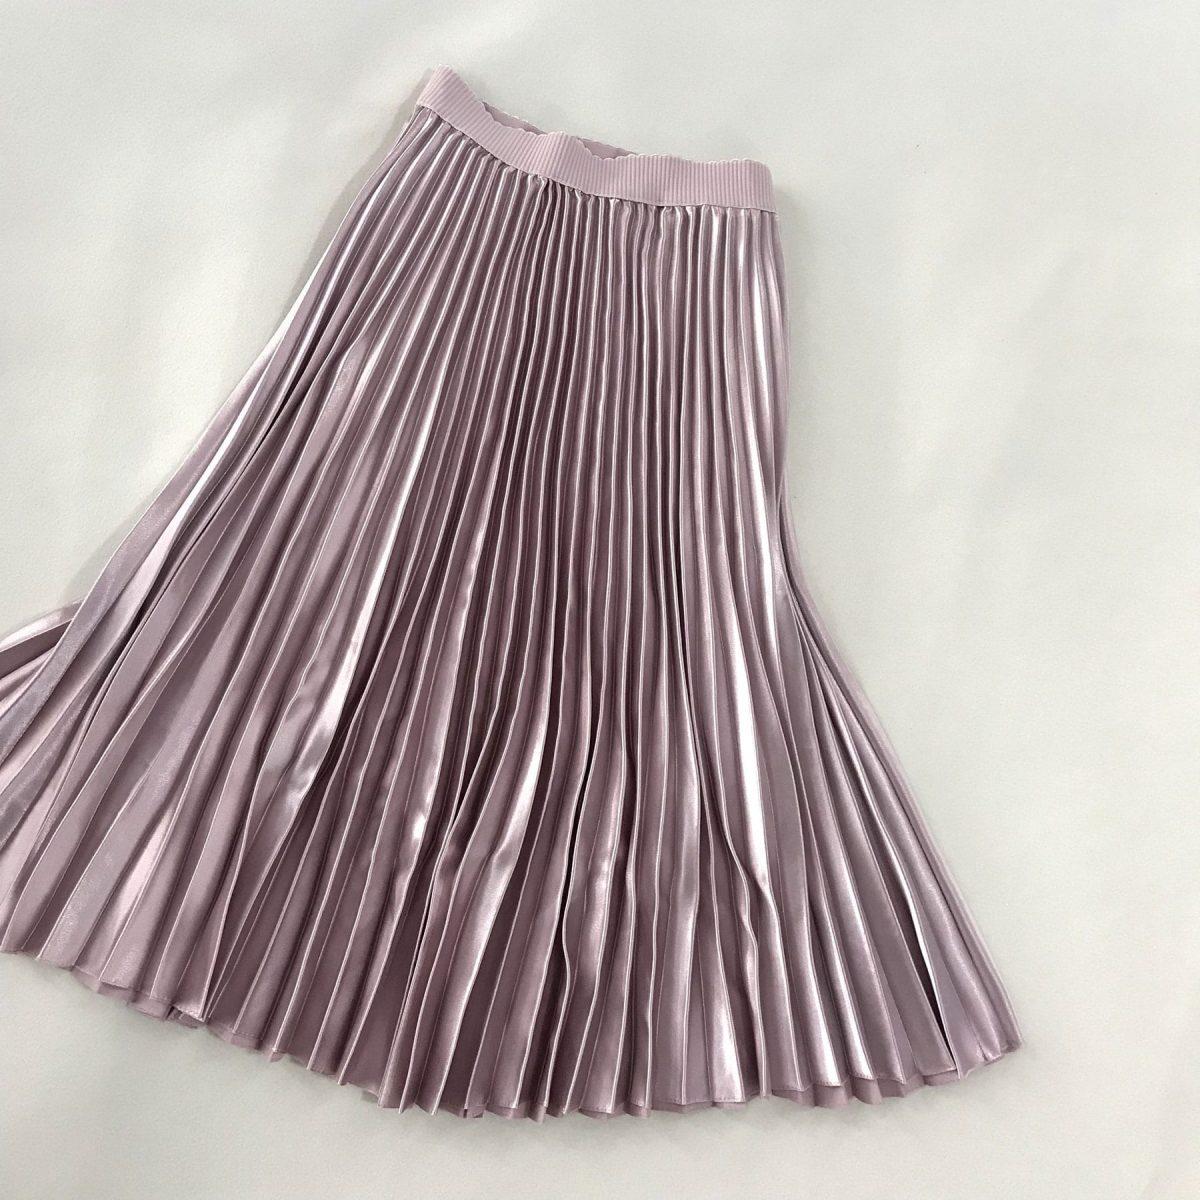 Pink A-line Pleated High Waist Midi Skirt